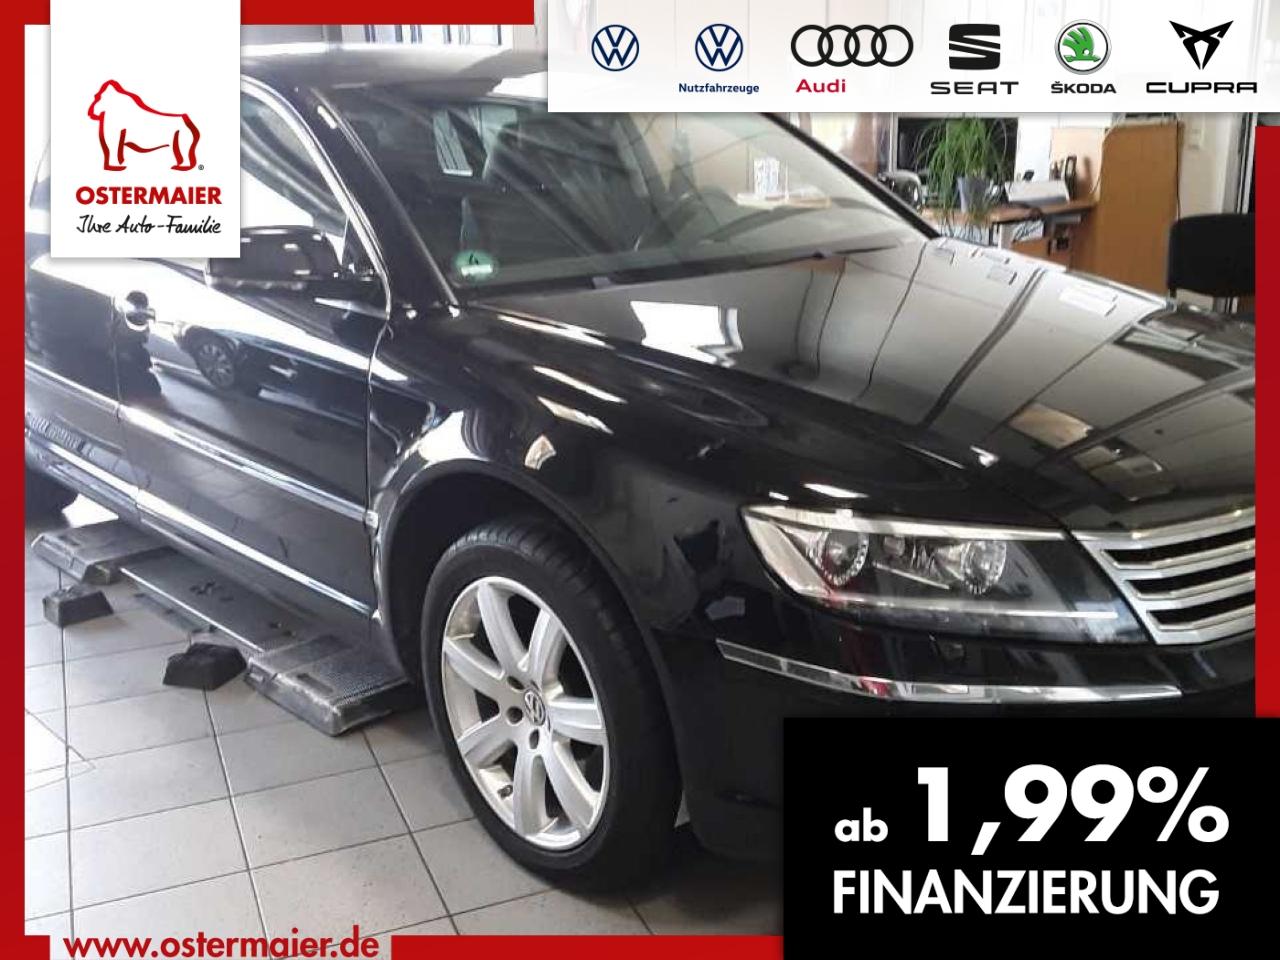 Volkswagen Phaeton LANG 3.0TDI 245PS 4M LEDER.NAVI.BI-XENON, Jahr 2015, Diesel